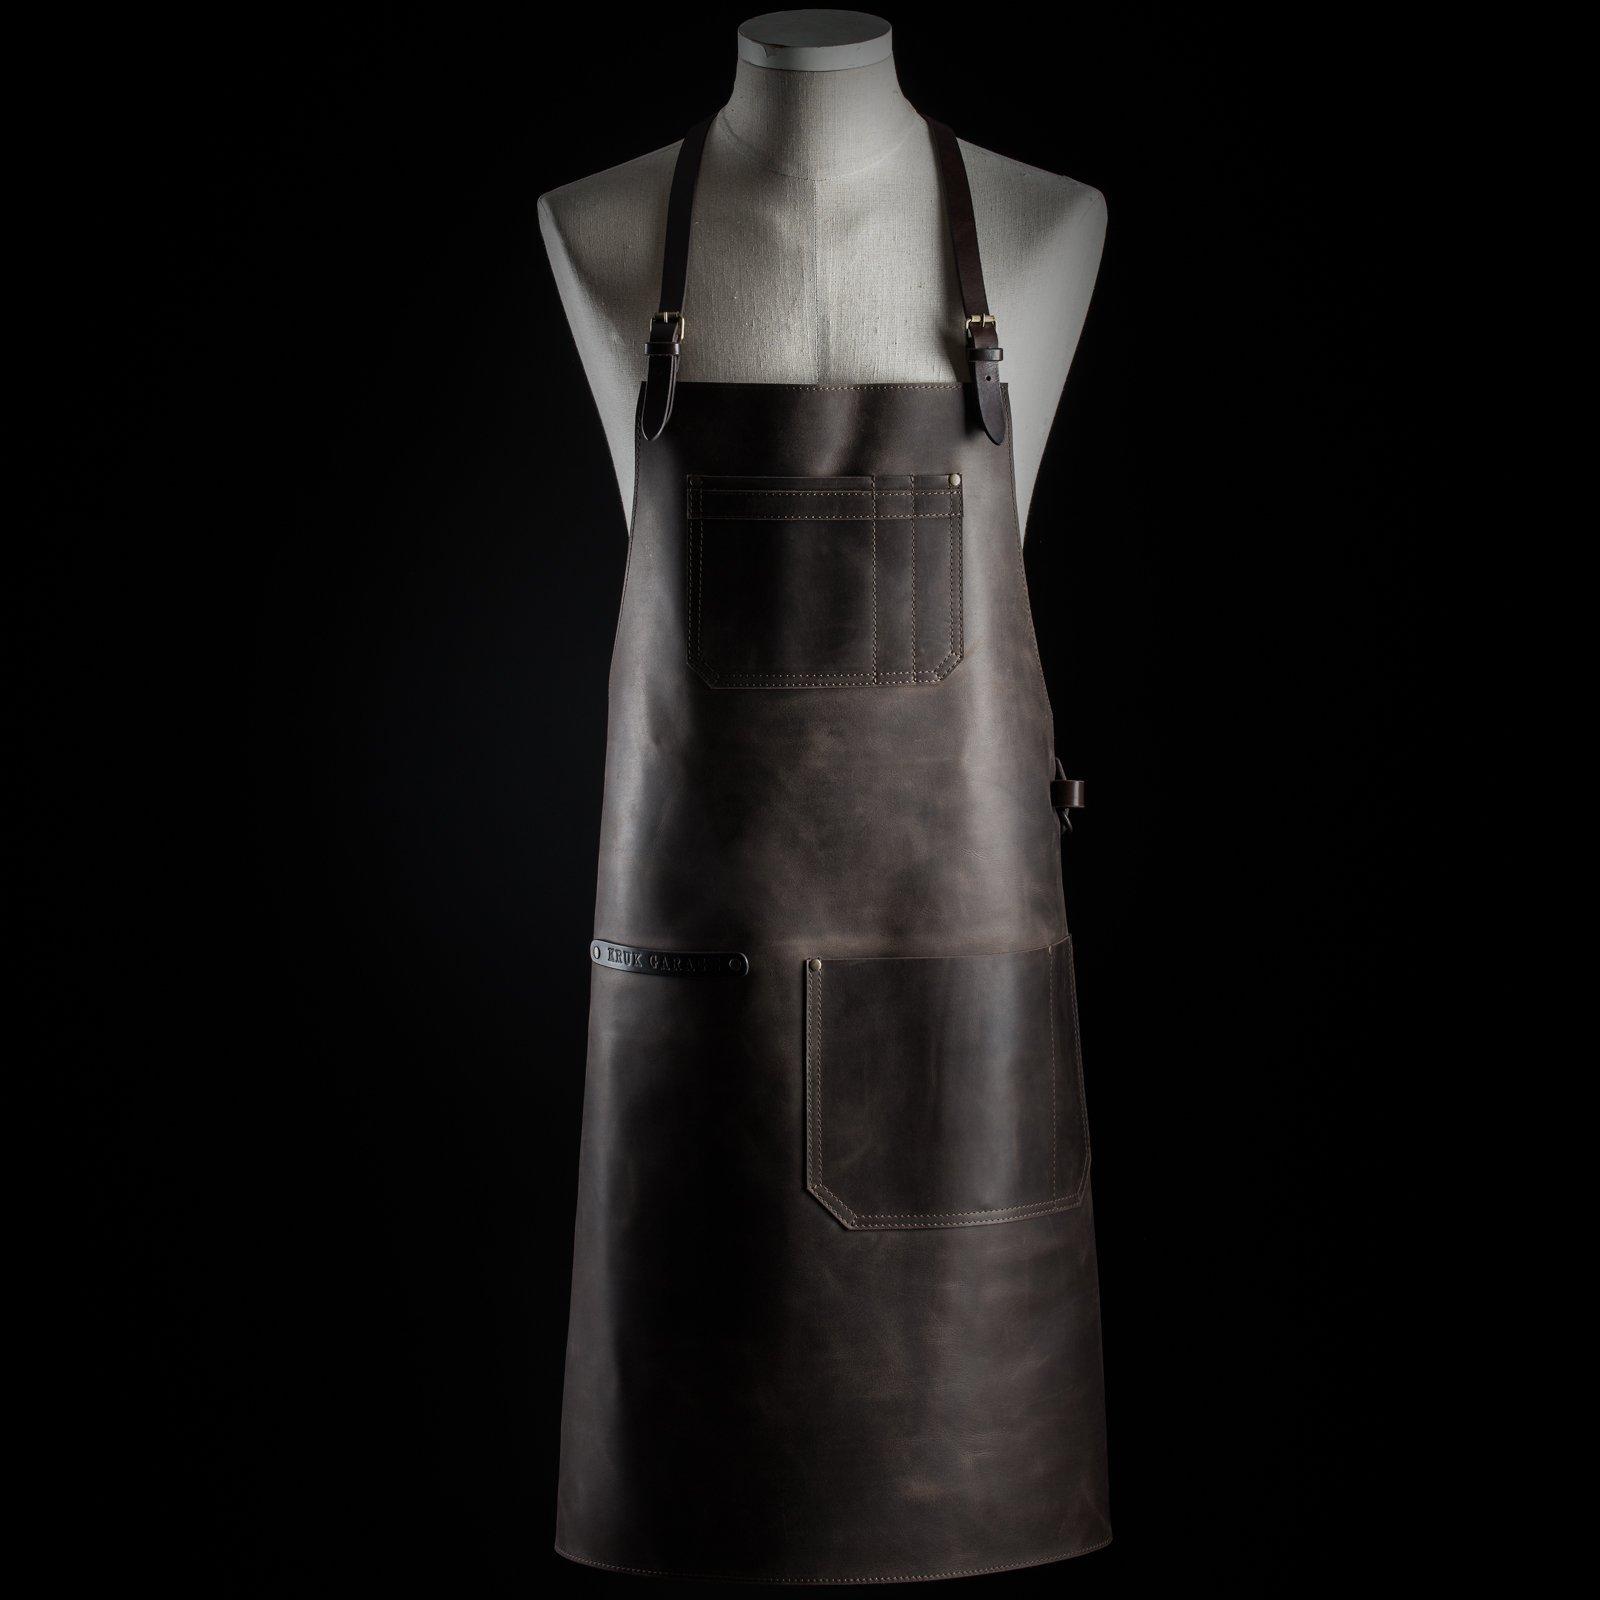 Bartender apron by Kruk Garage Barista apron Leather apron Barbers apron Unisex apron Chef apron Men gift Birthday gift FREE PERSONALIZATION